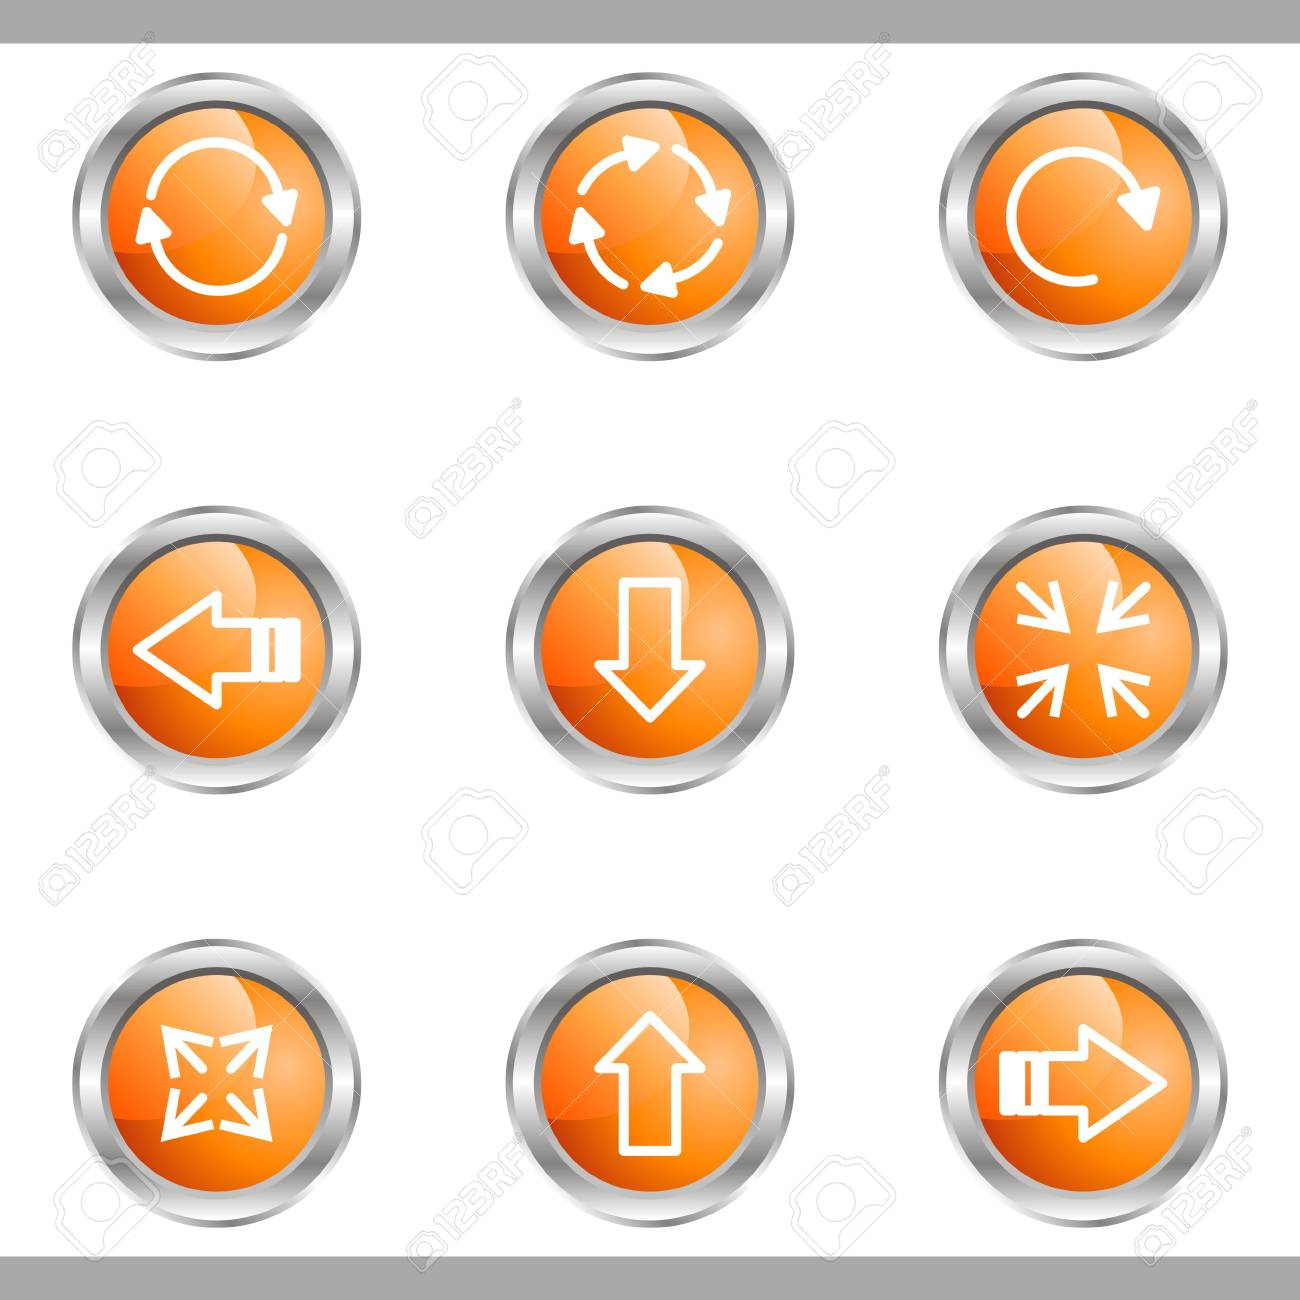 Set of 9 glossy web icons (set 2). Metallic circle. Stock Vector - 16682298